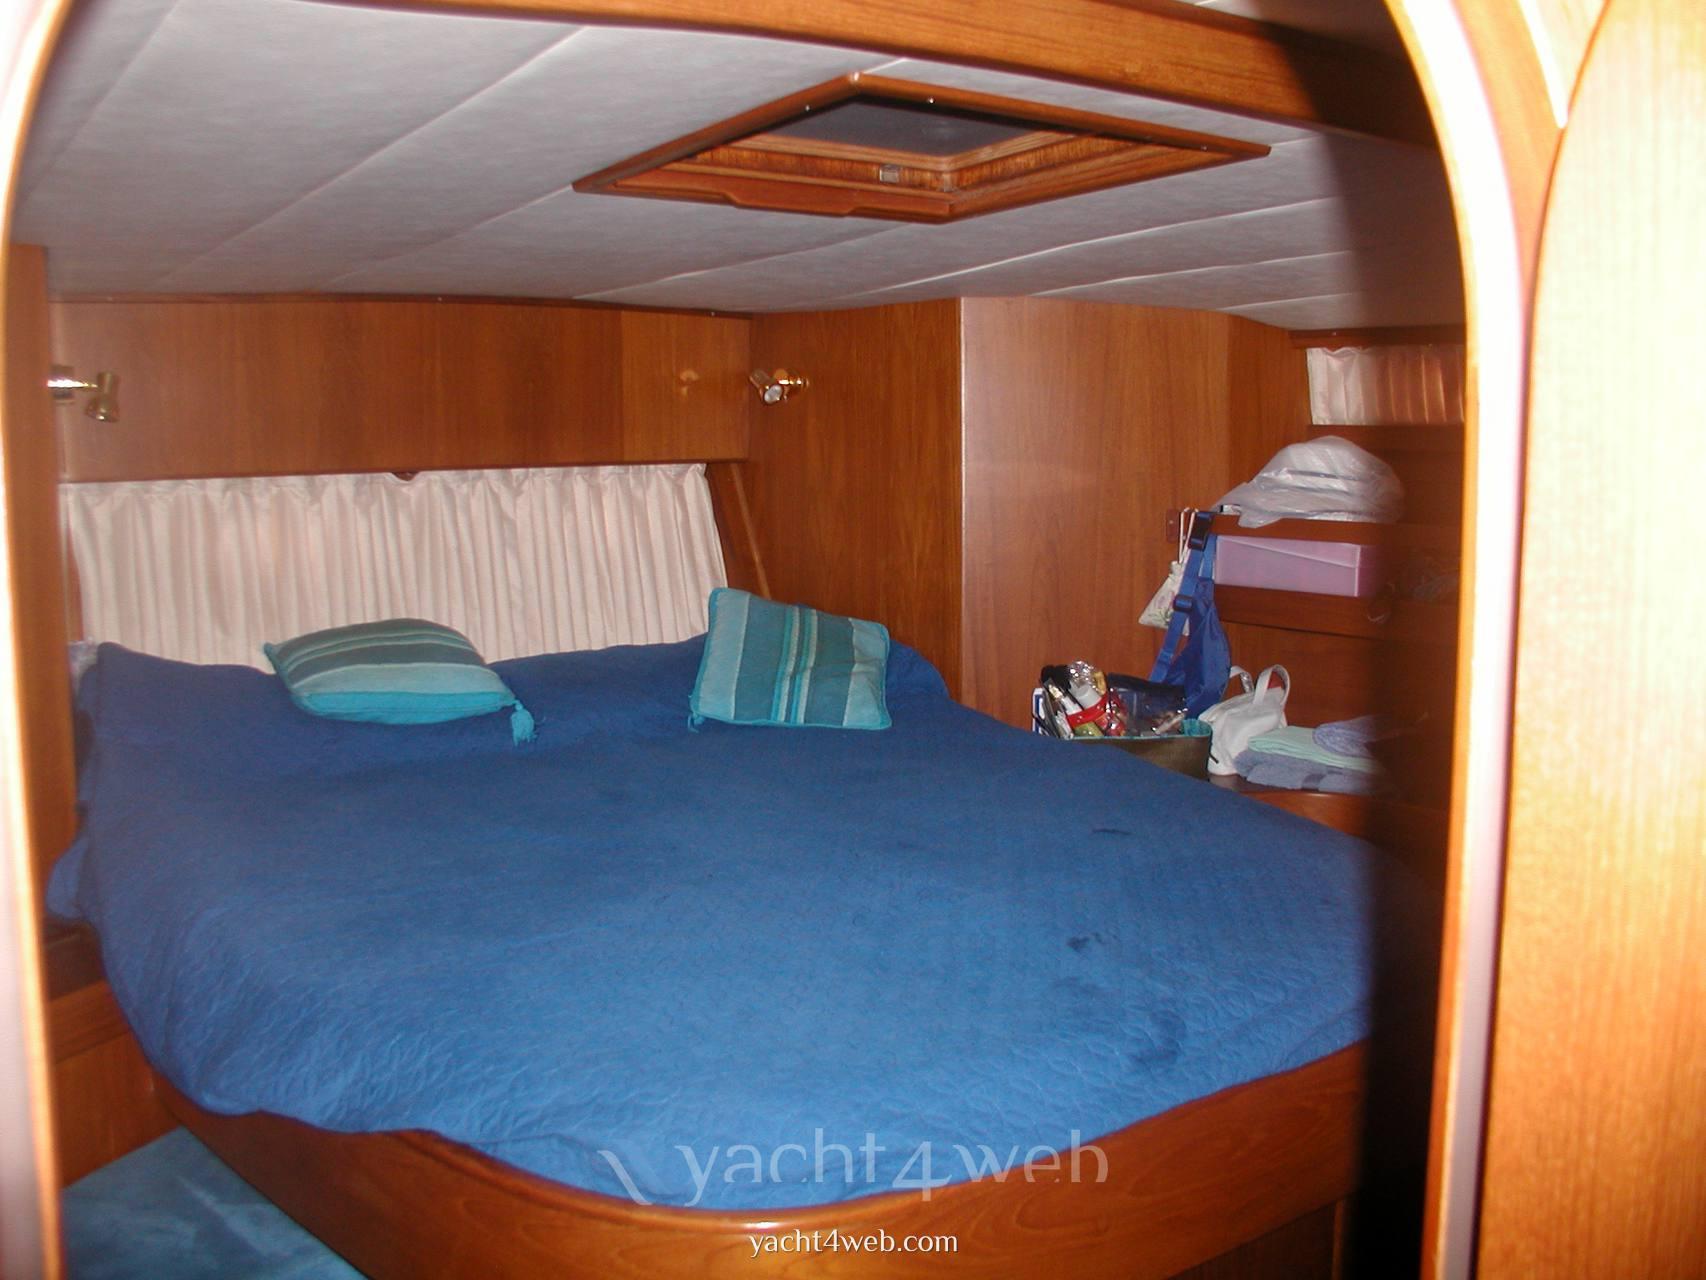 Franchini 45l Barca a vela usata in vendita